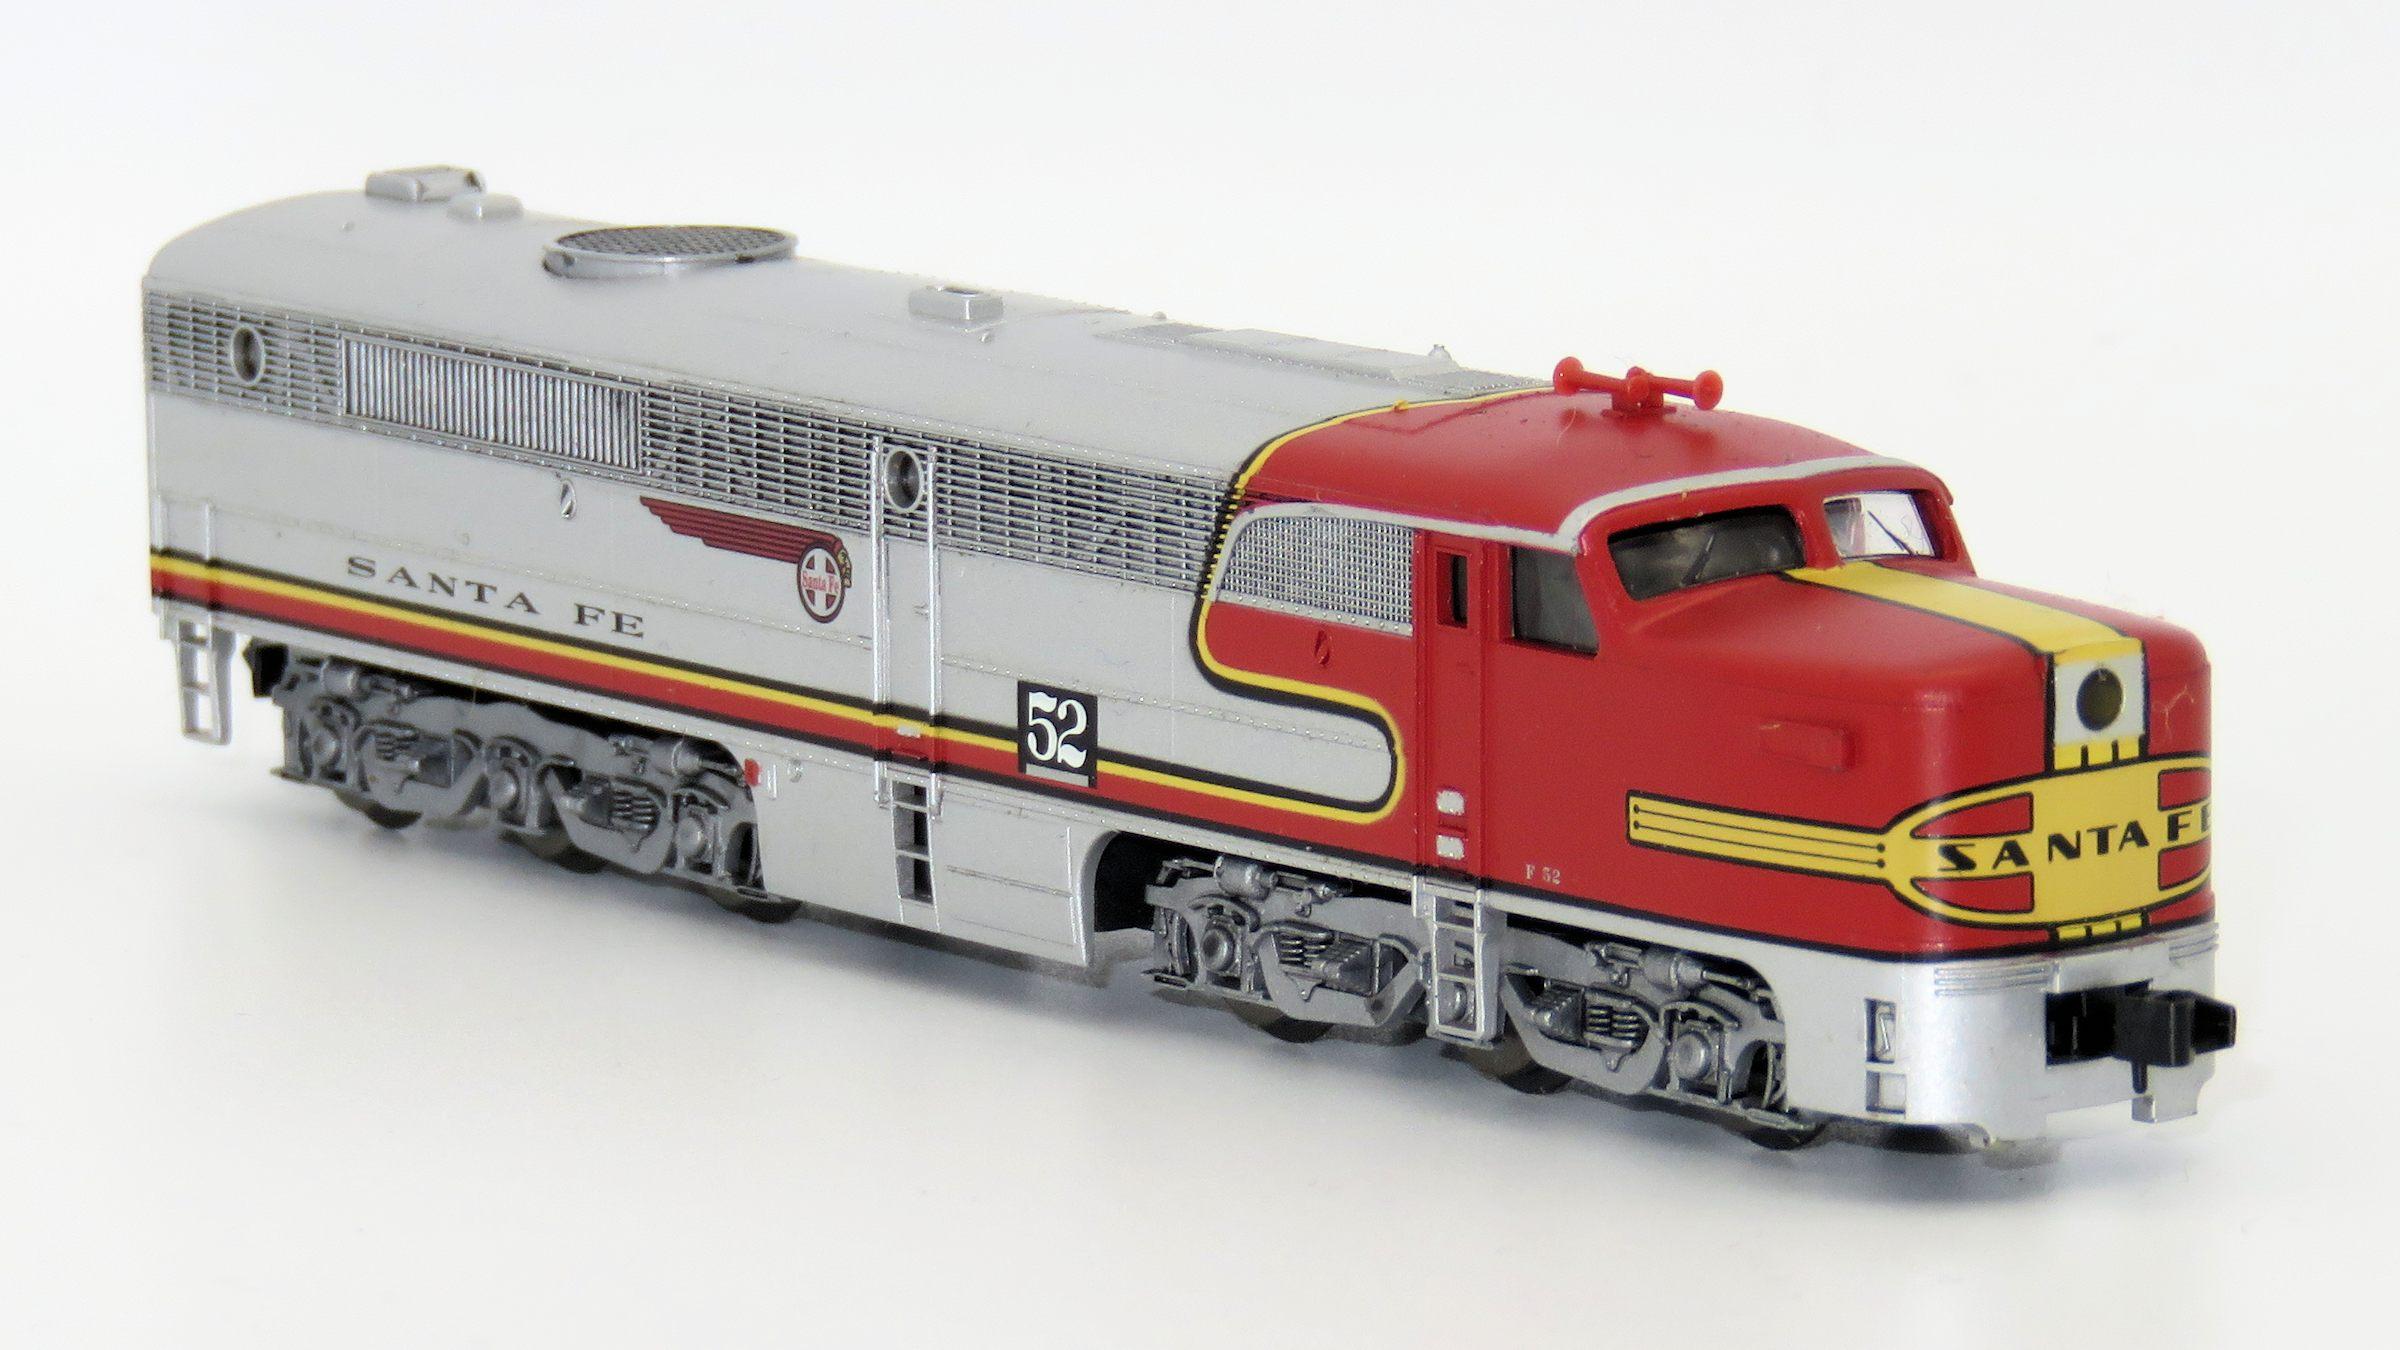 N Scale - Brawa - 1086 - Locomotive, Diesel, Alco PA-1 - Santa Fe - 52